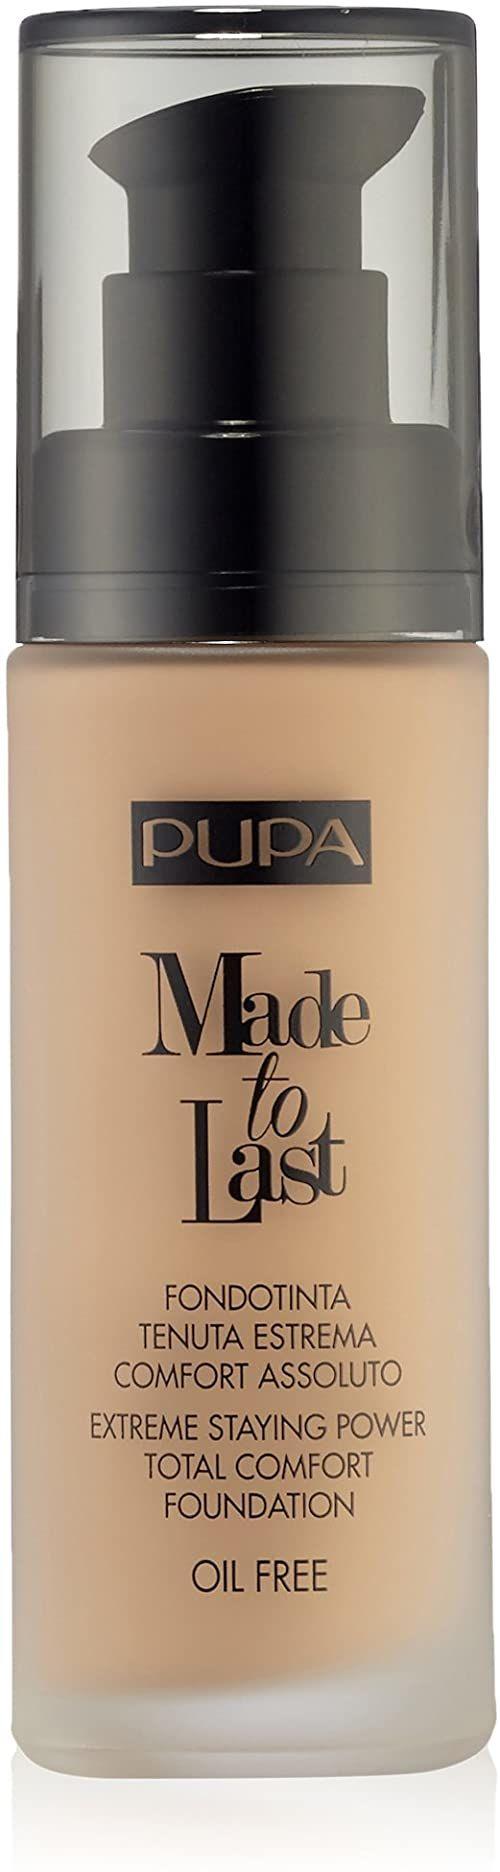 Pupa Made To Last Foundation 040 Medium Beige, 30 ml